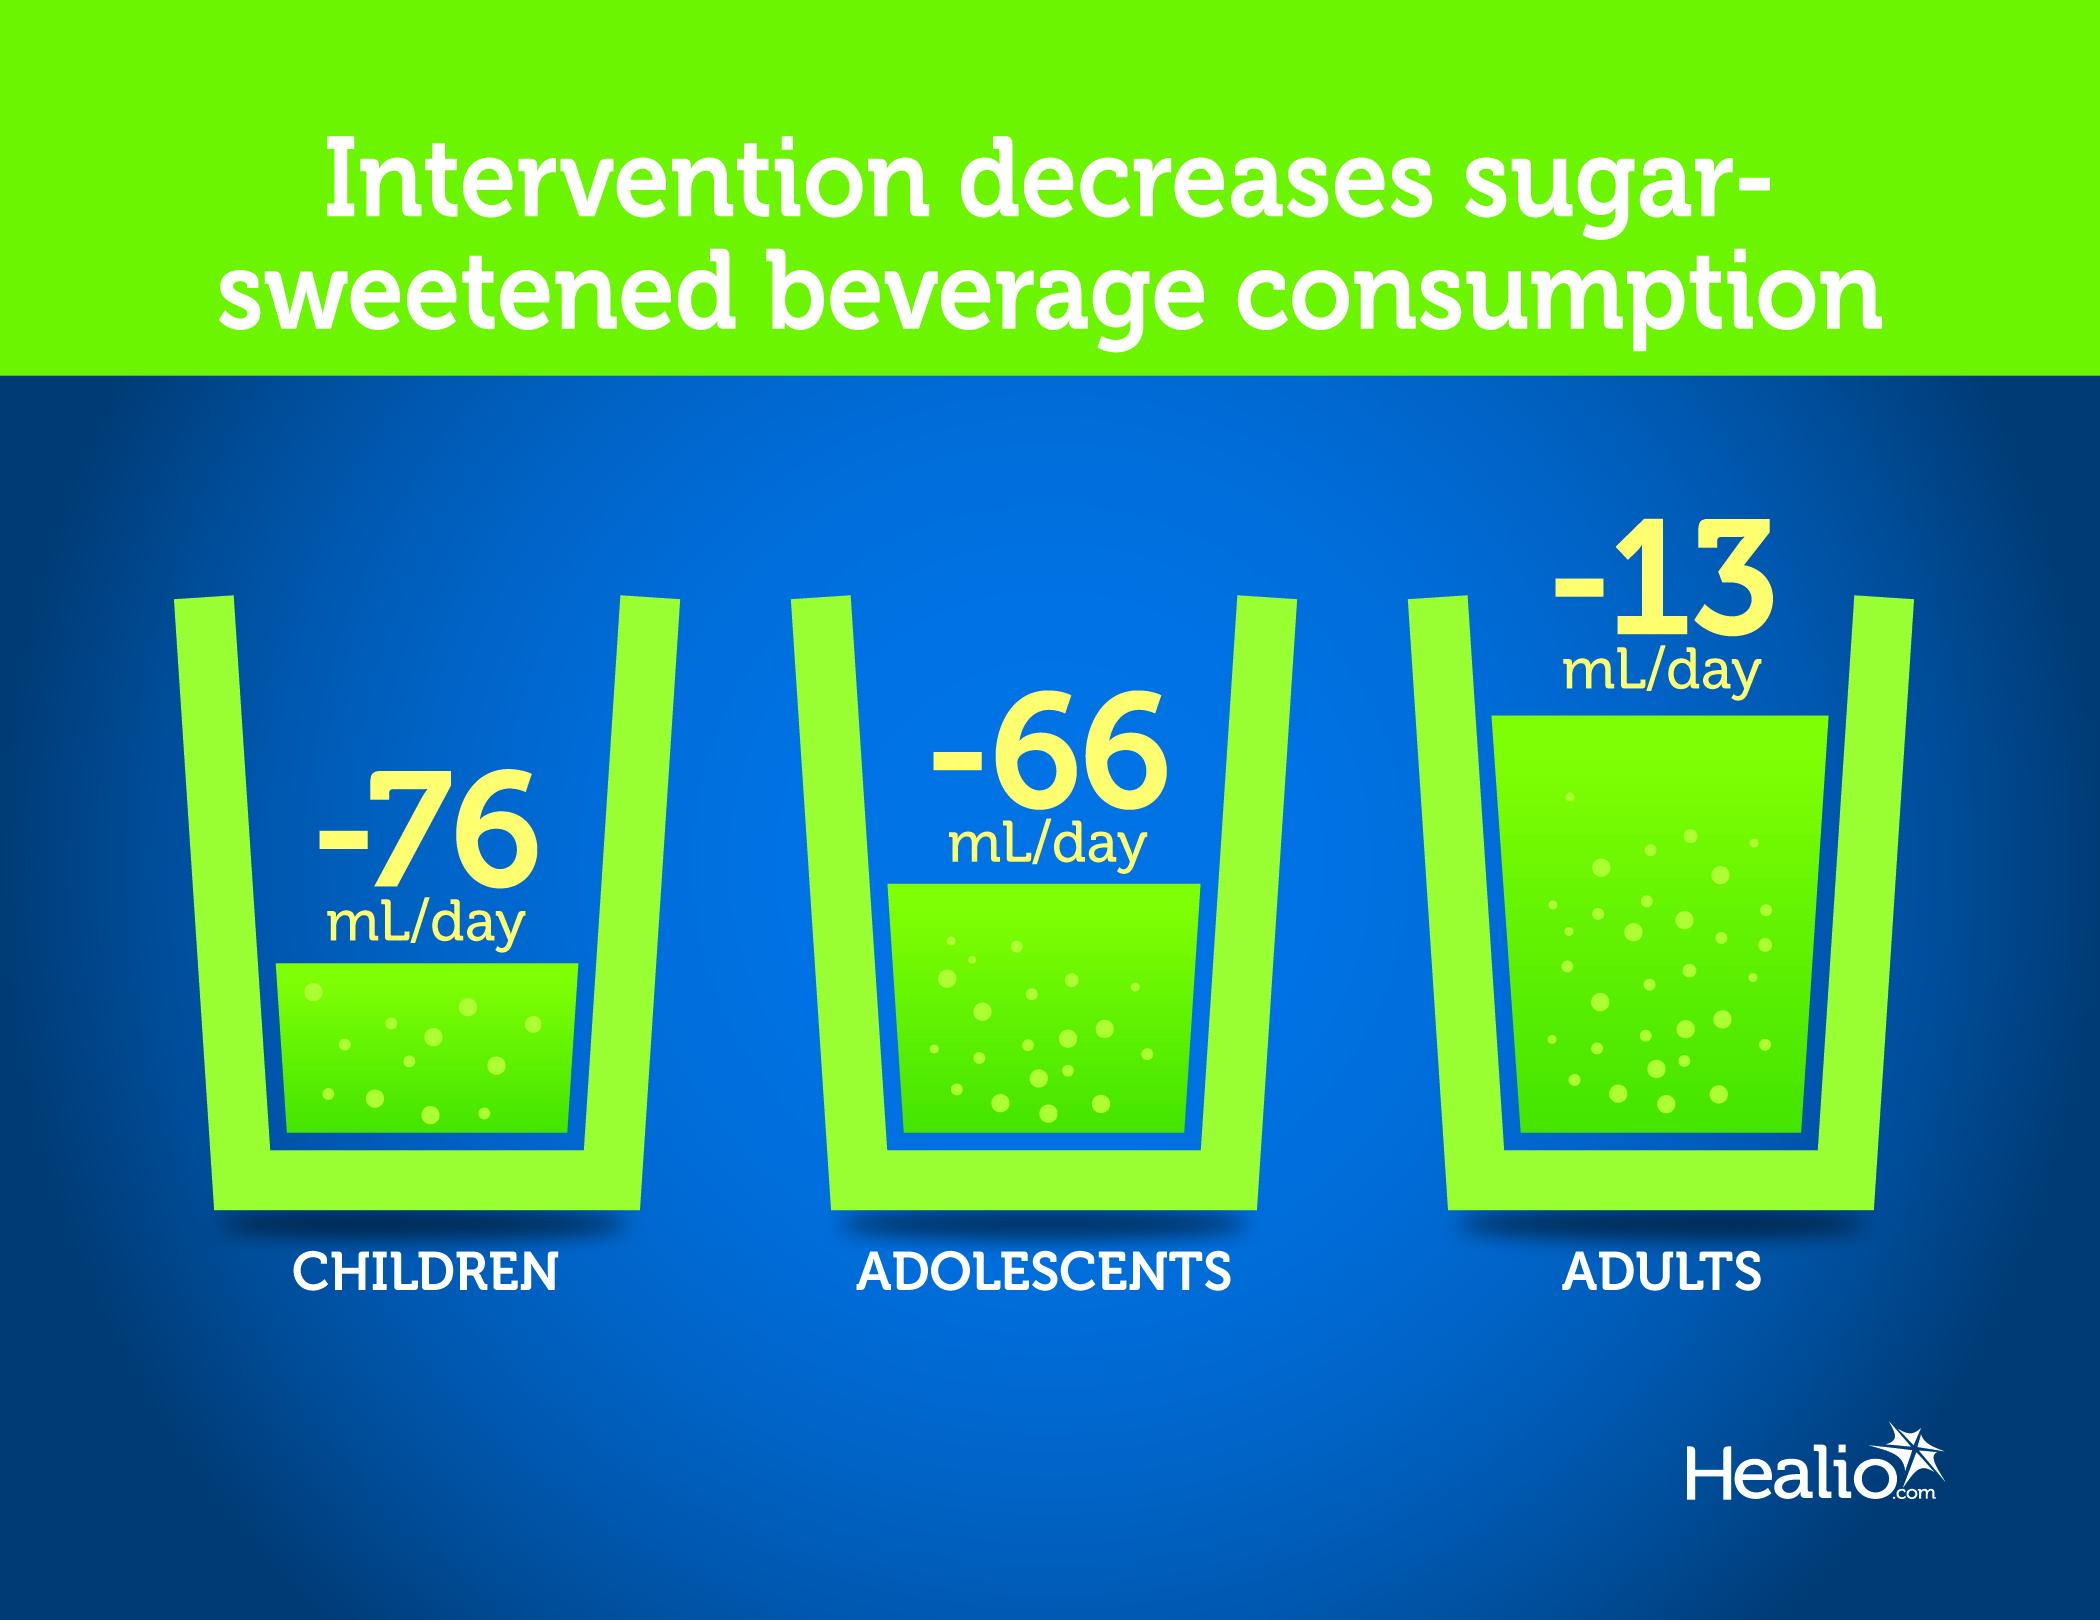 interventions reduce sugar